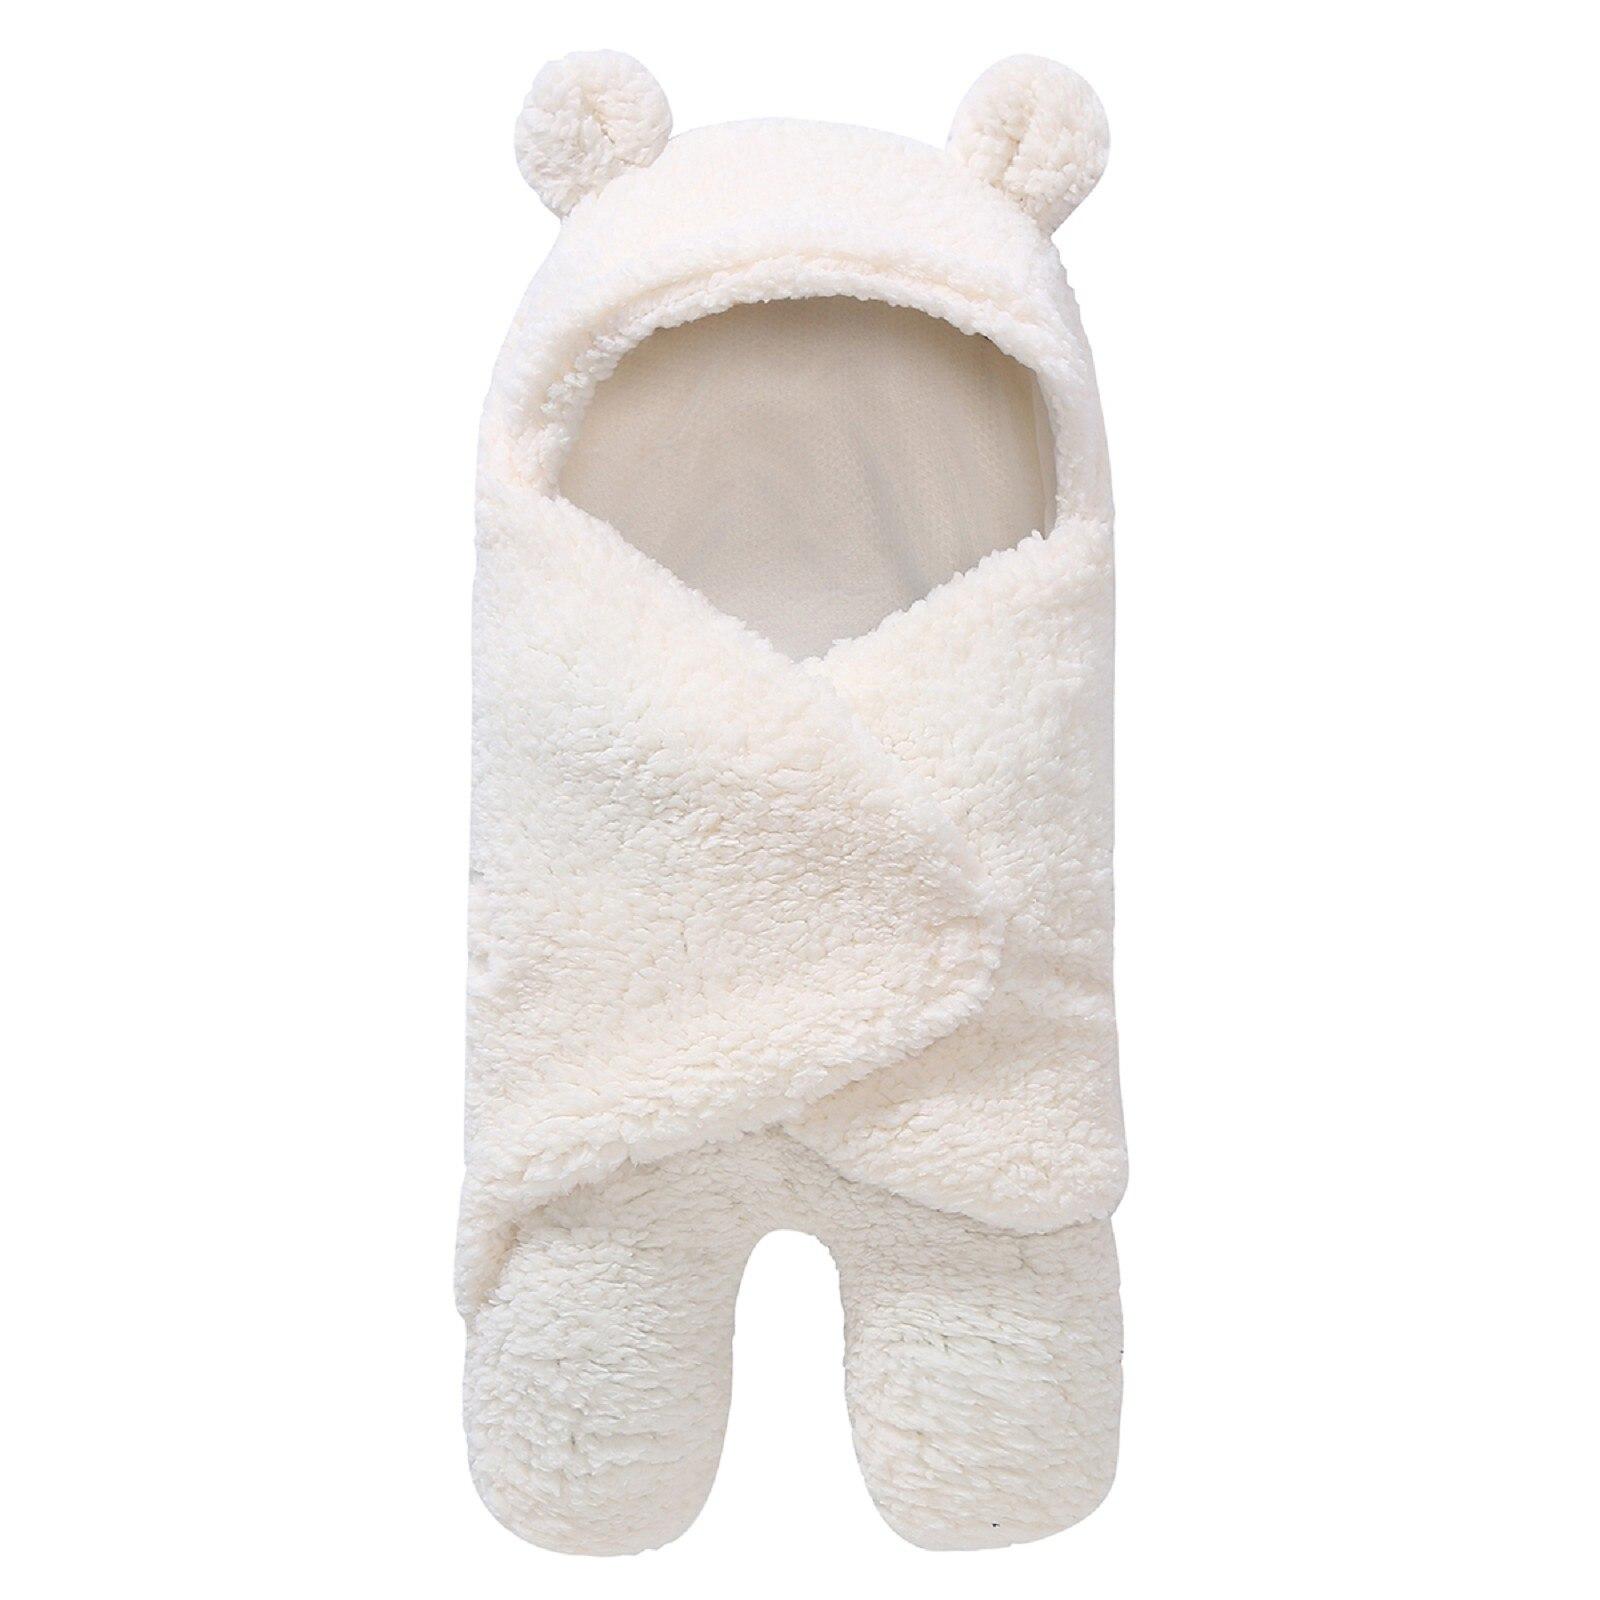 Newborn Baby Girls Boys Sleeping Bag Swaddle Wrap Stroller Bed Blanket